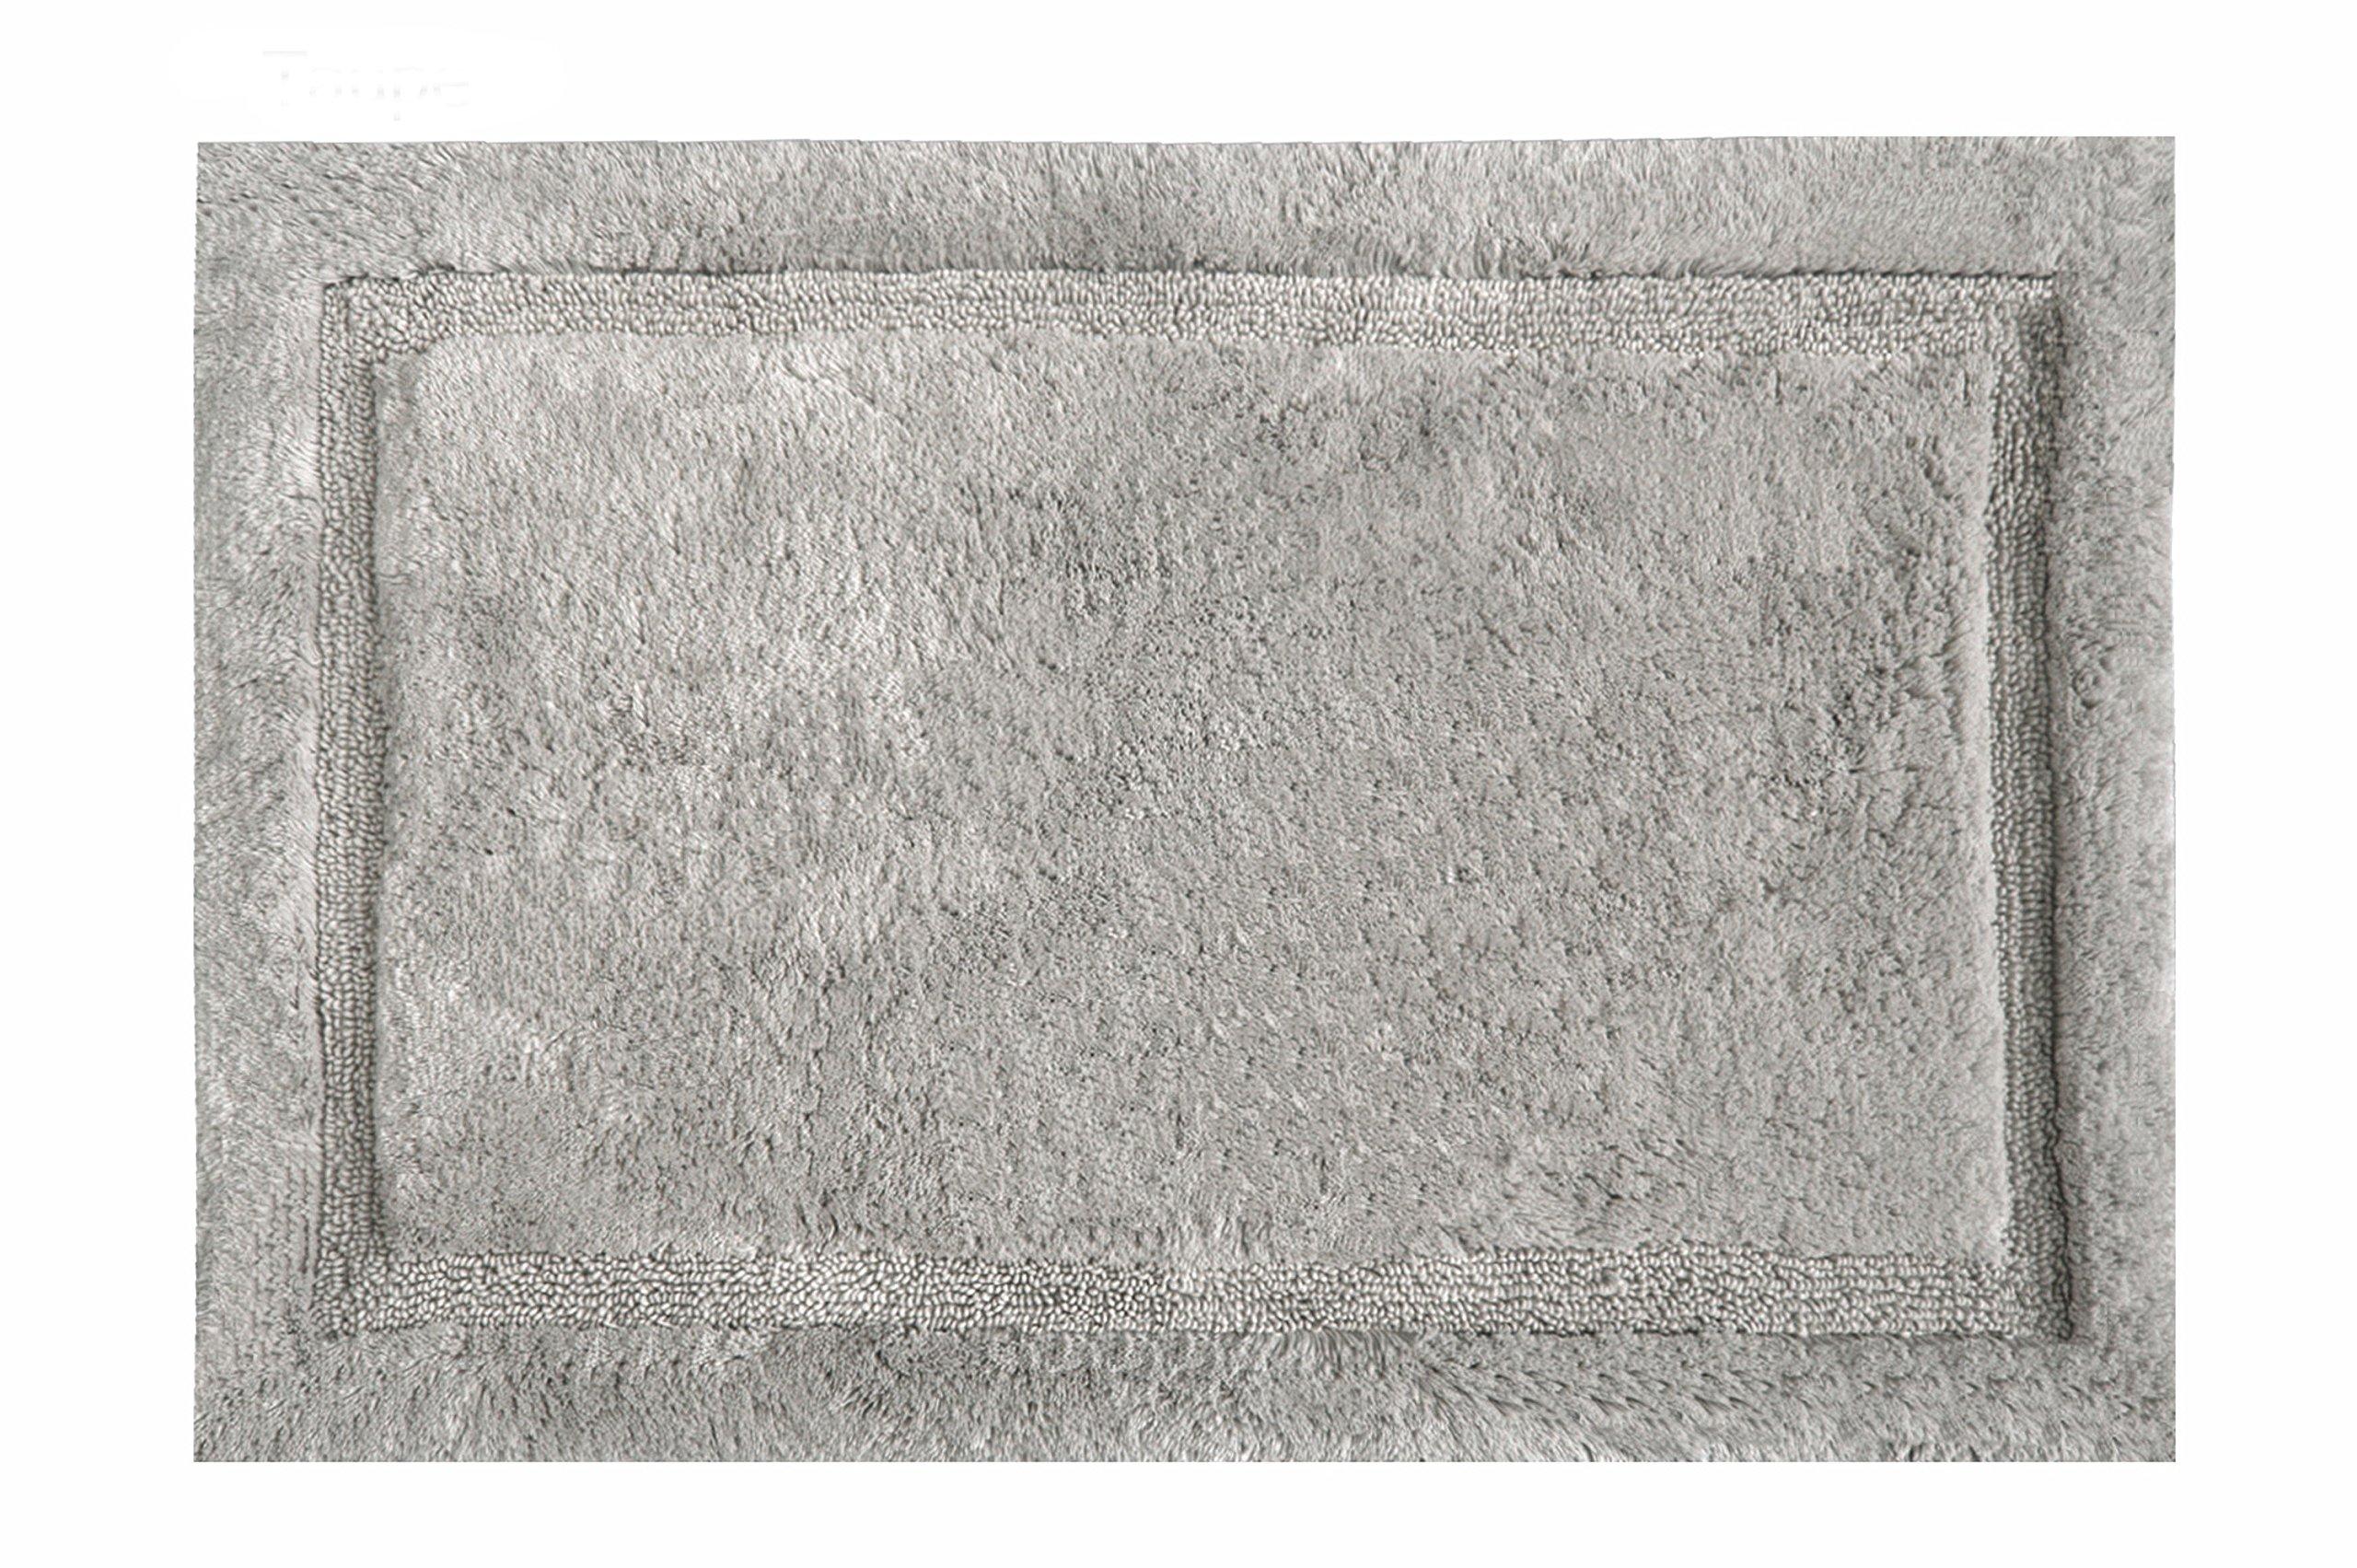 Grund Asheville Series 100% Organic Cotton Bath Rug, 24-Inch by 40-Inch, Taupe